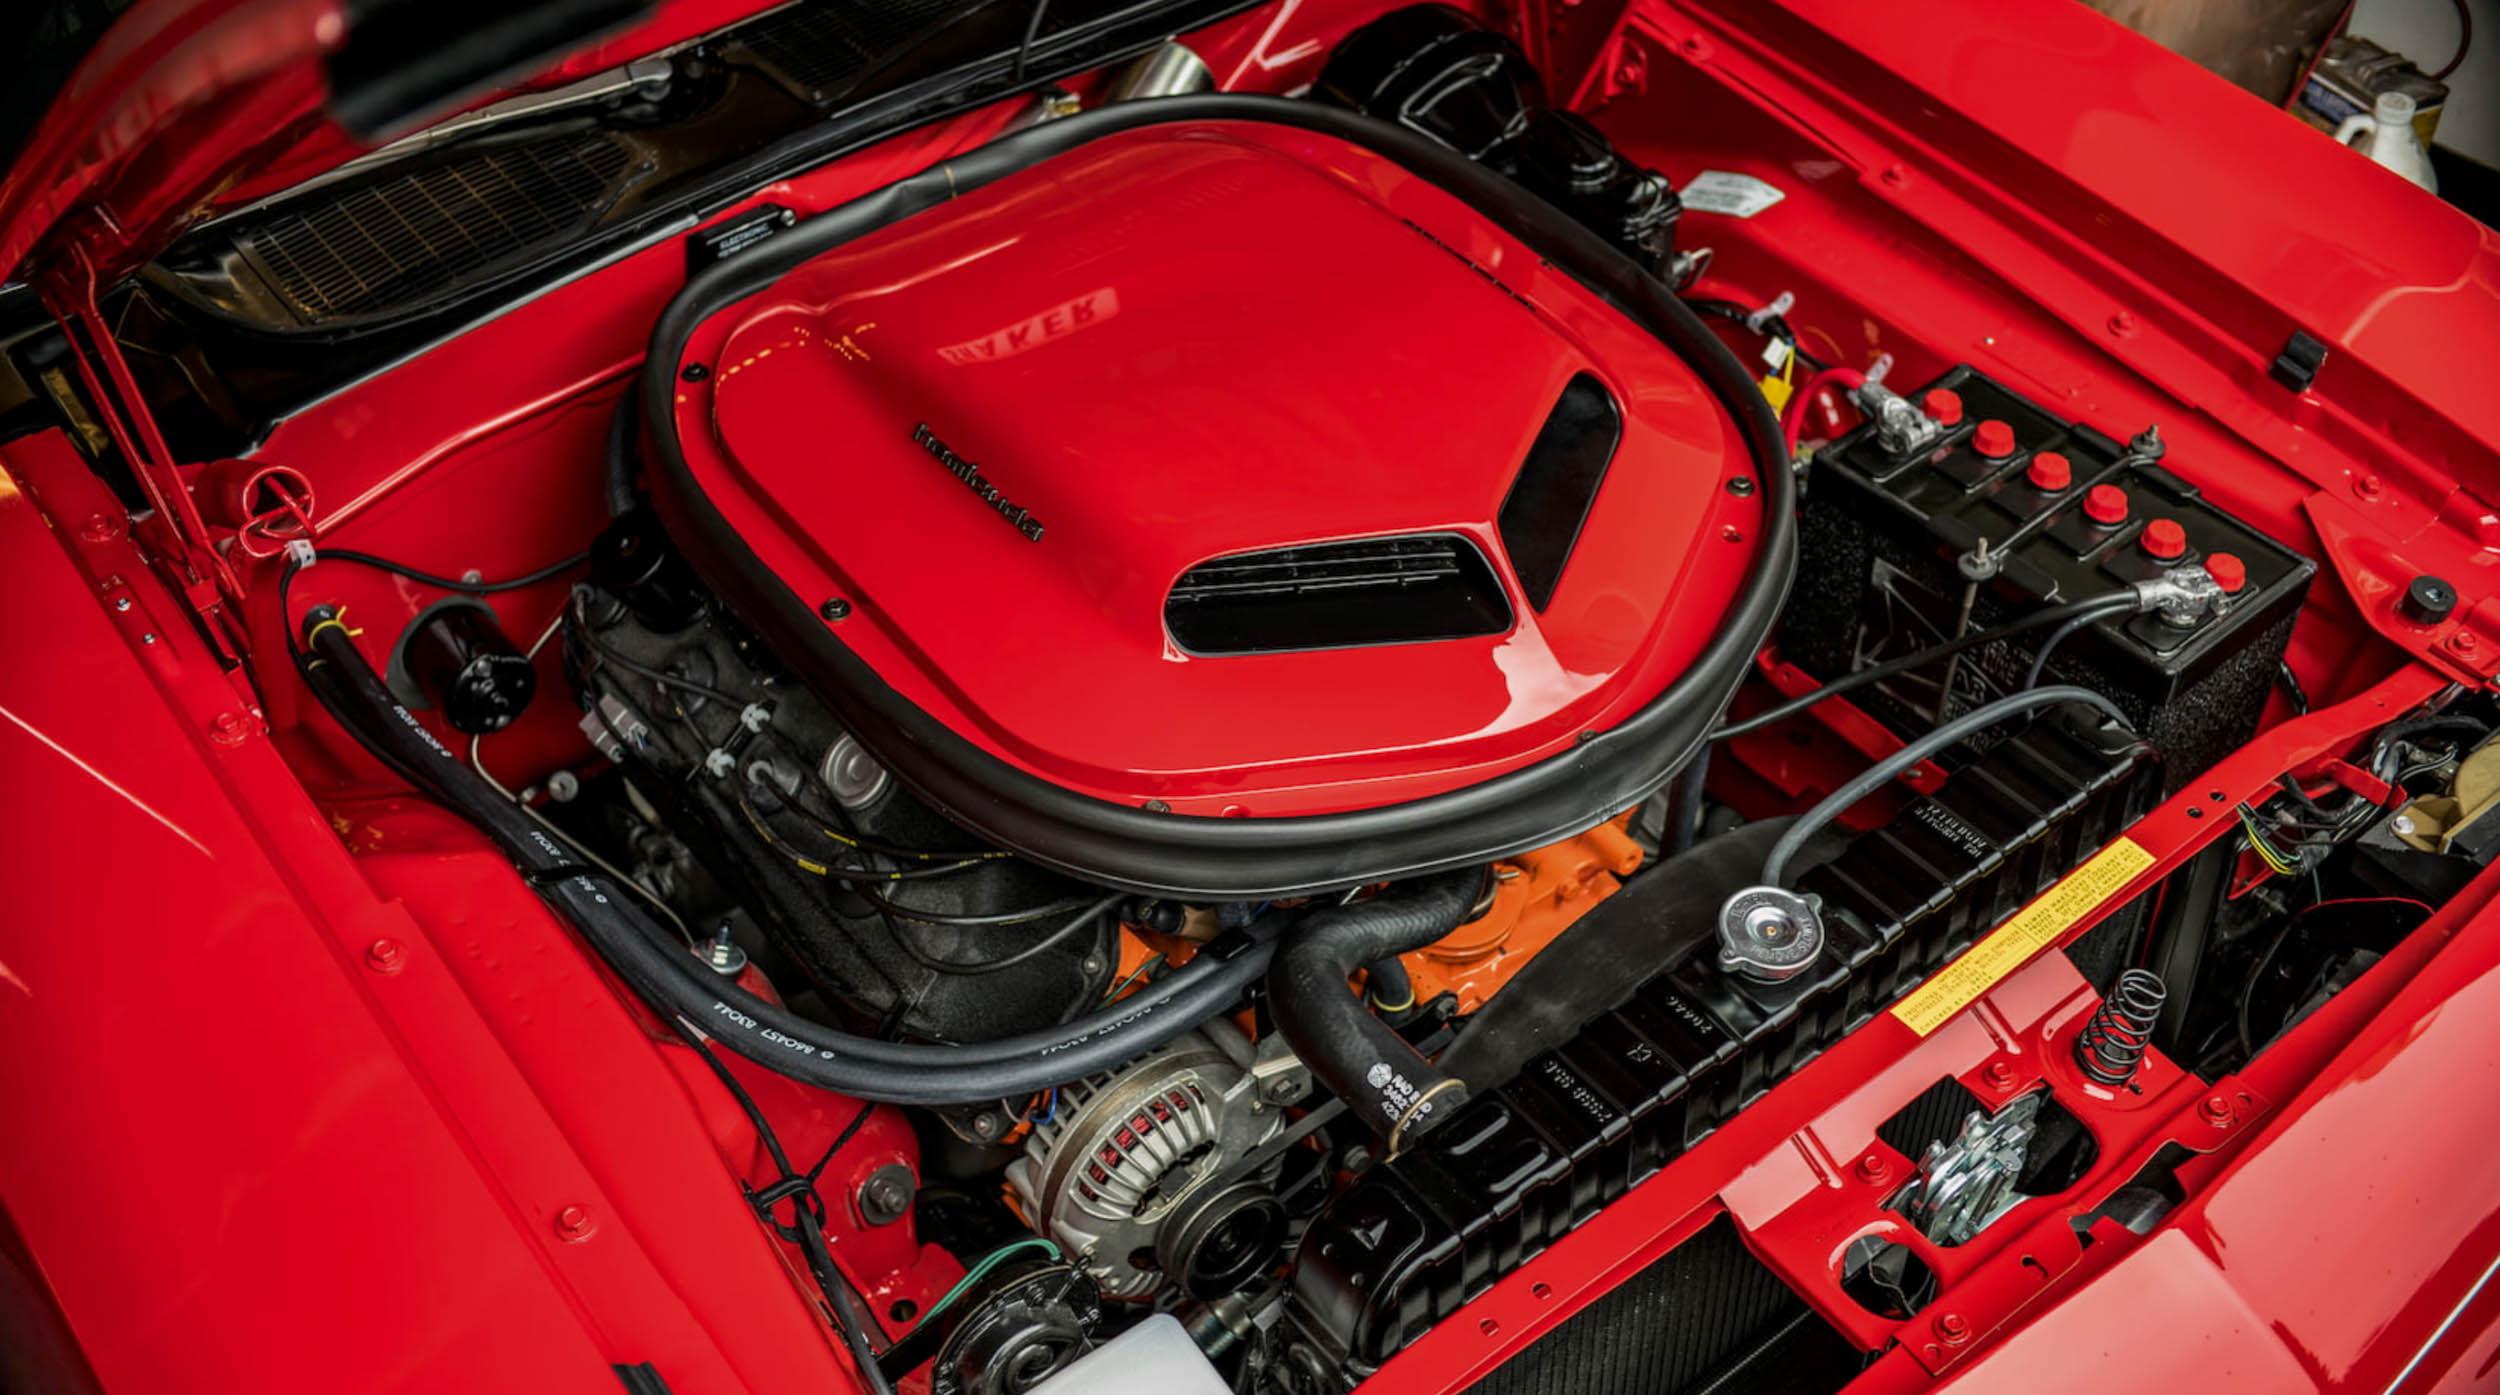 1970 Plymouth Cuda 426 Hemi Engine